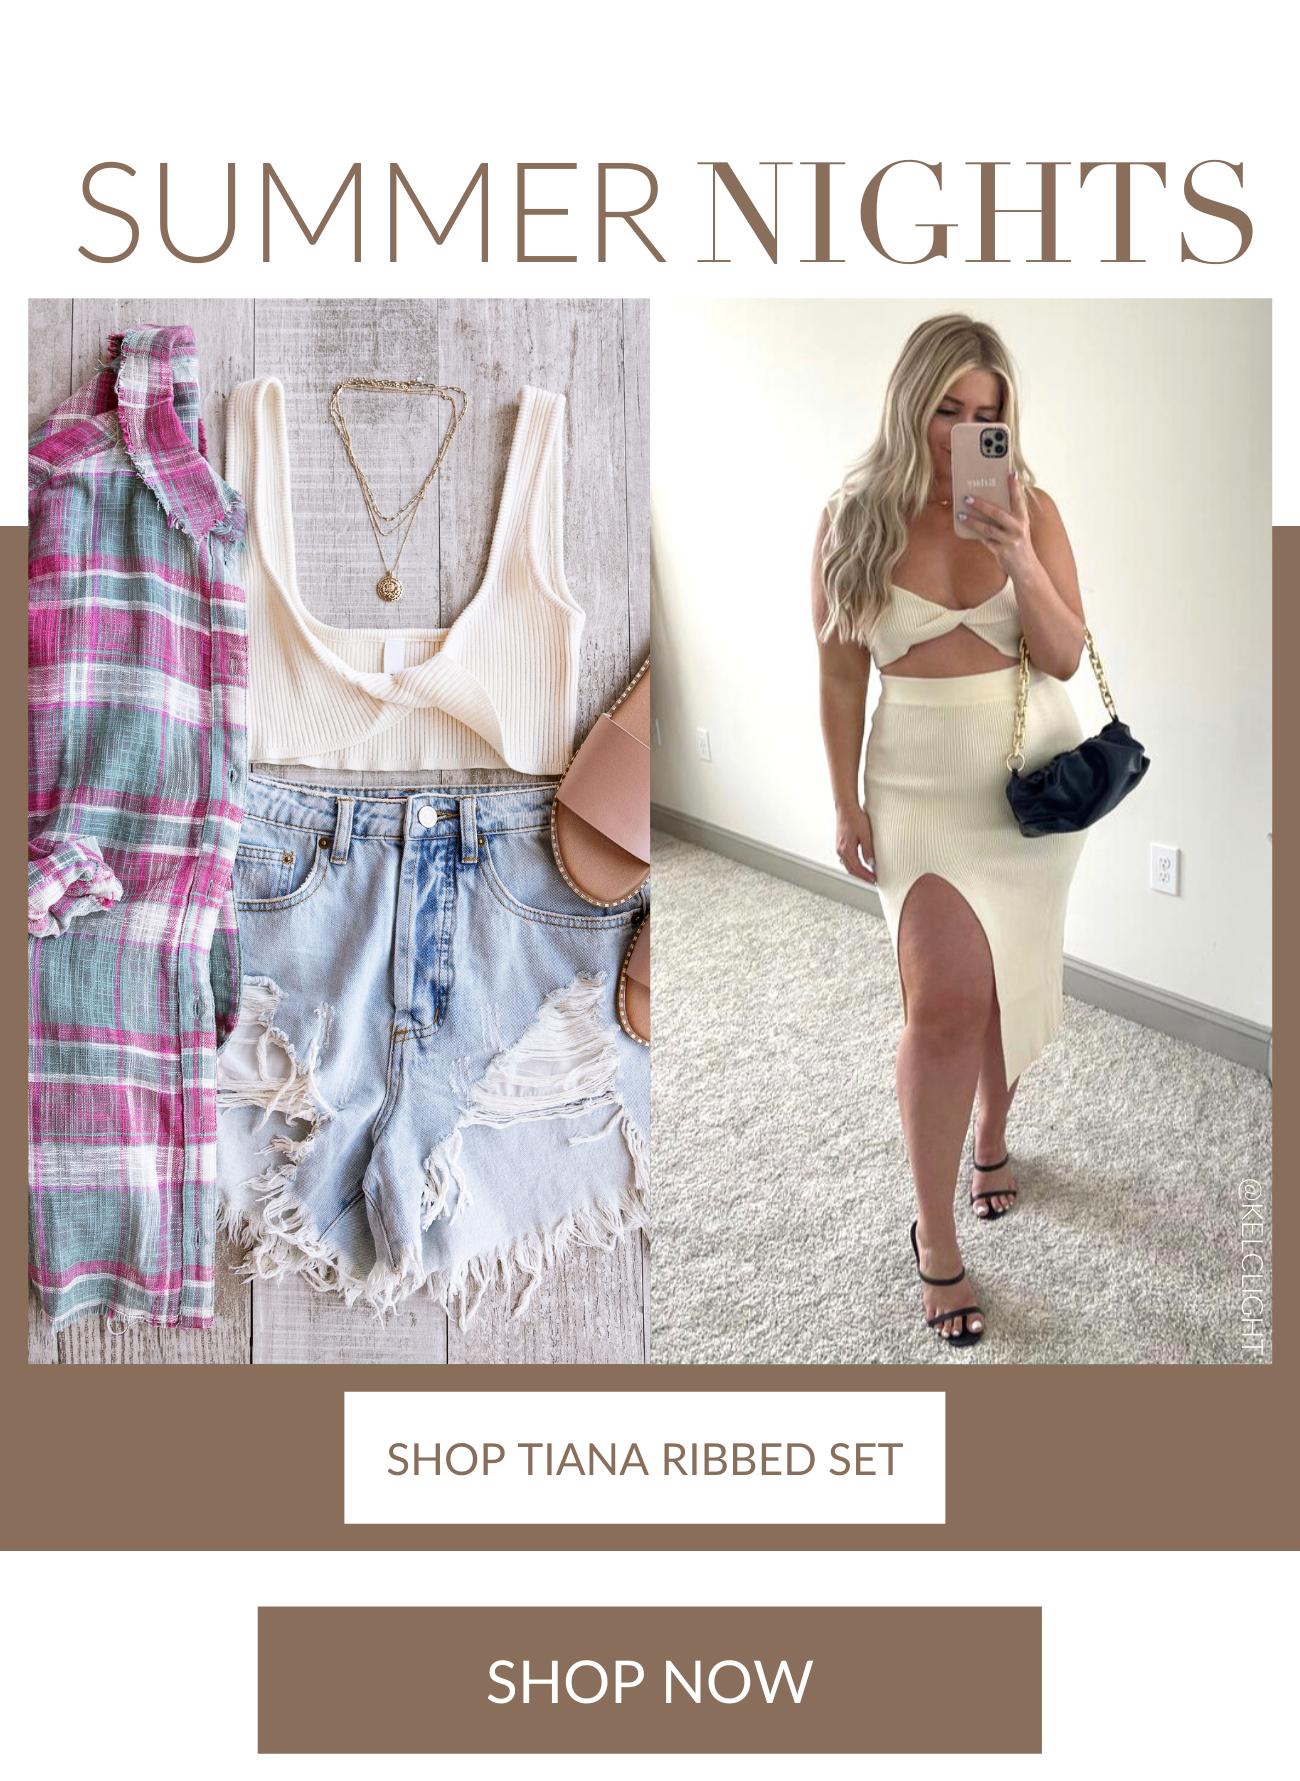 Shop Tiana Ribbed Set